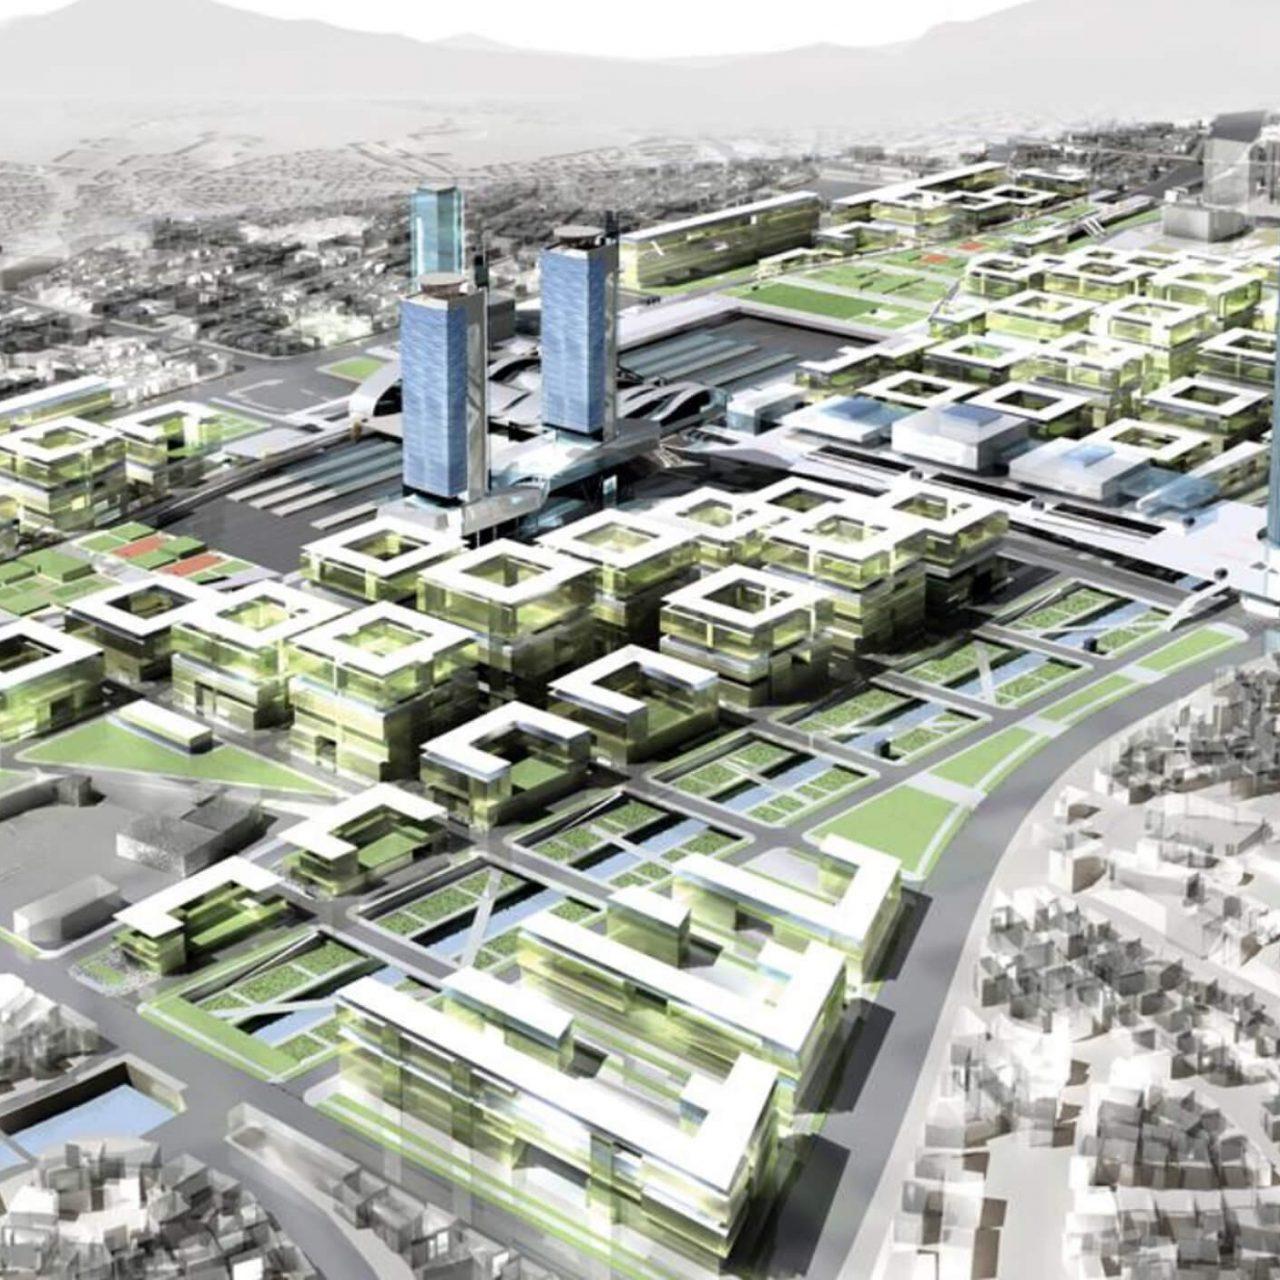 http://best-architects.ru/wp-content/uploads/2019/03/Kartinka2-1-1280x1280.jpg